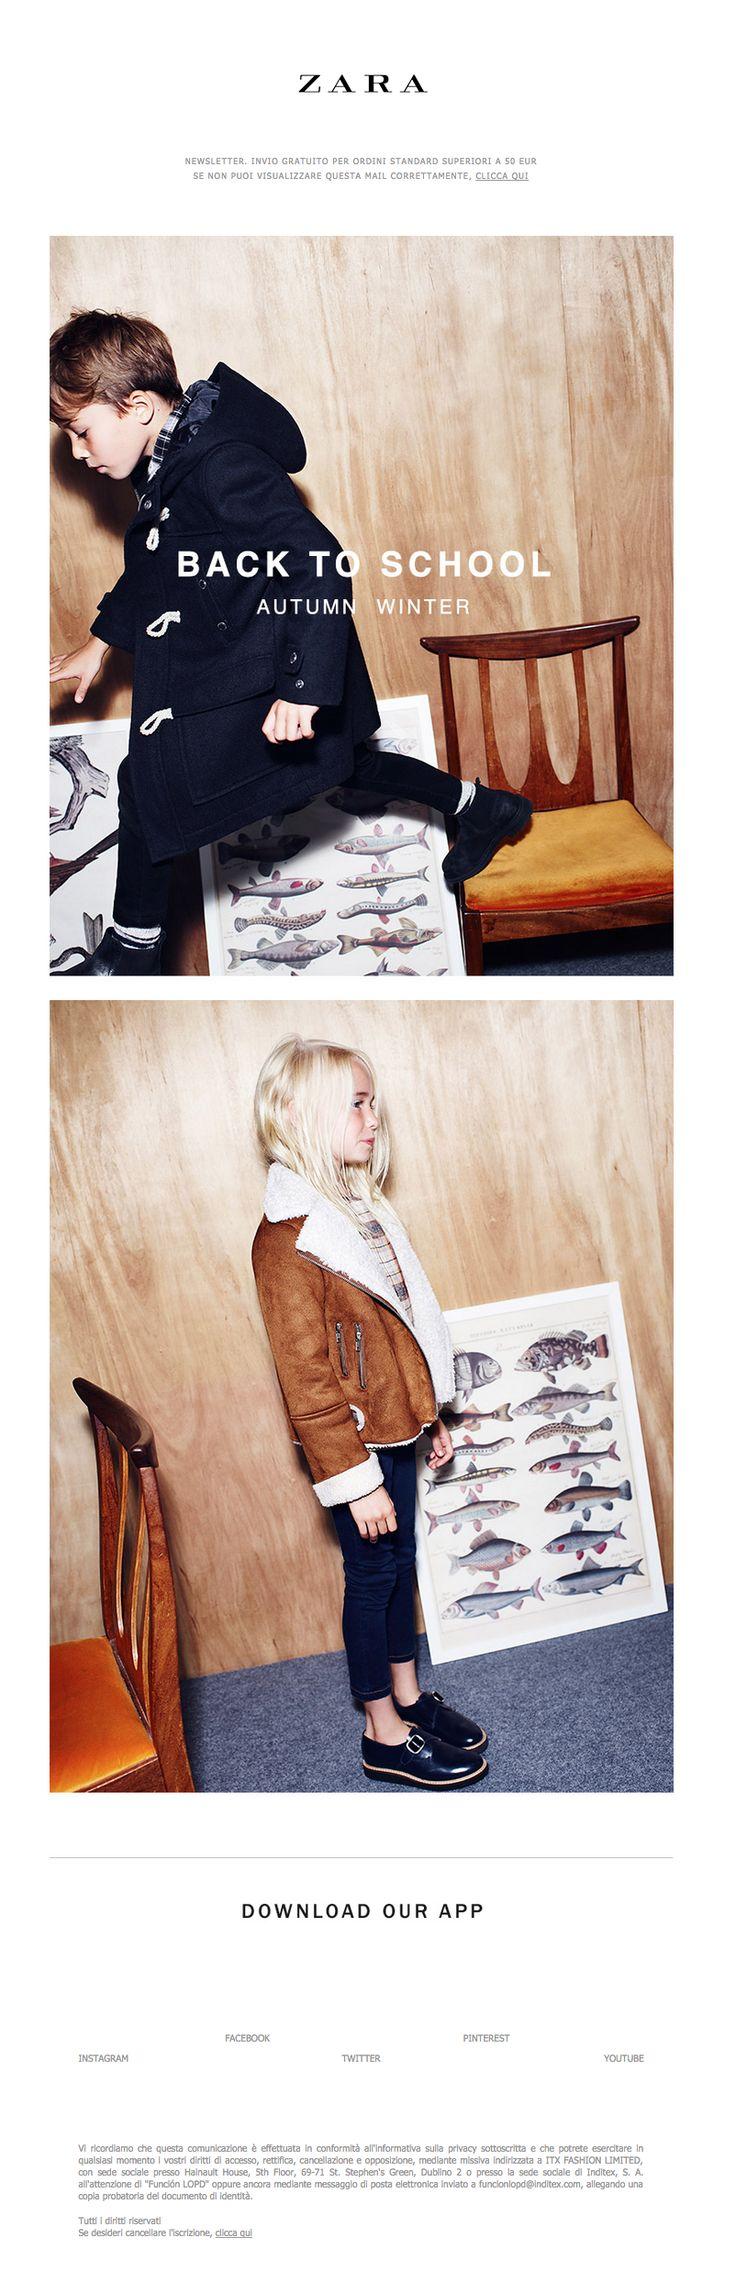 Zara | Back to school